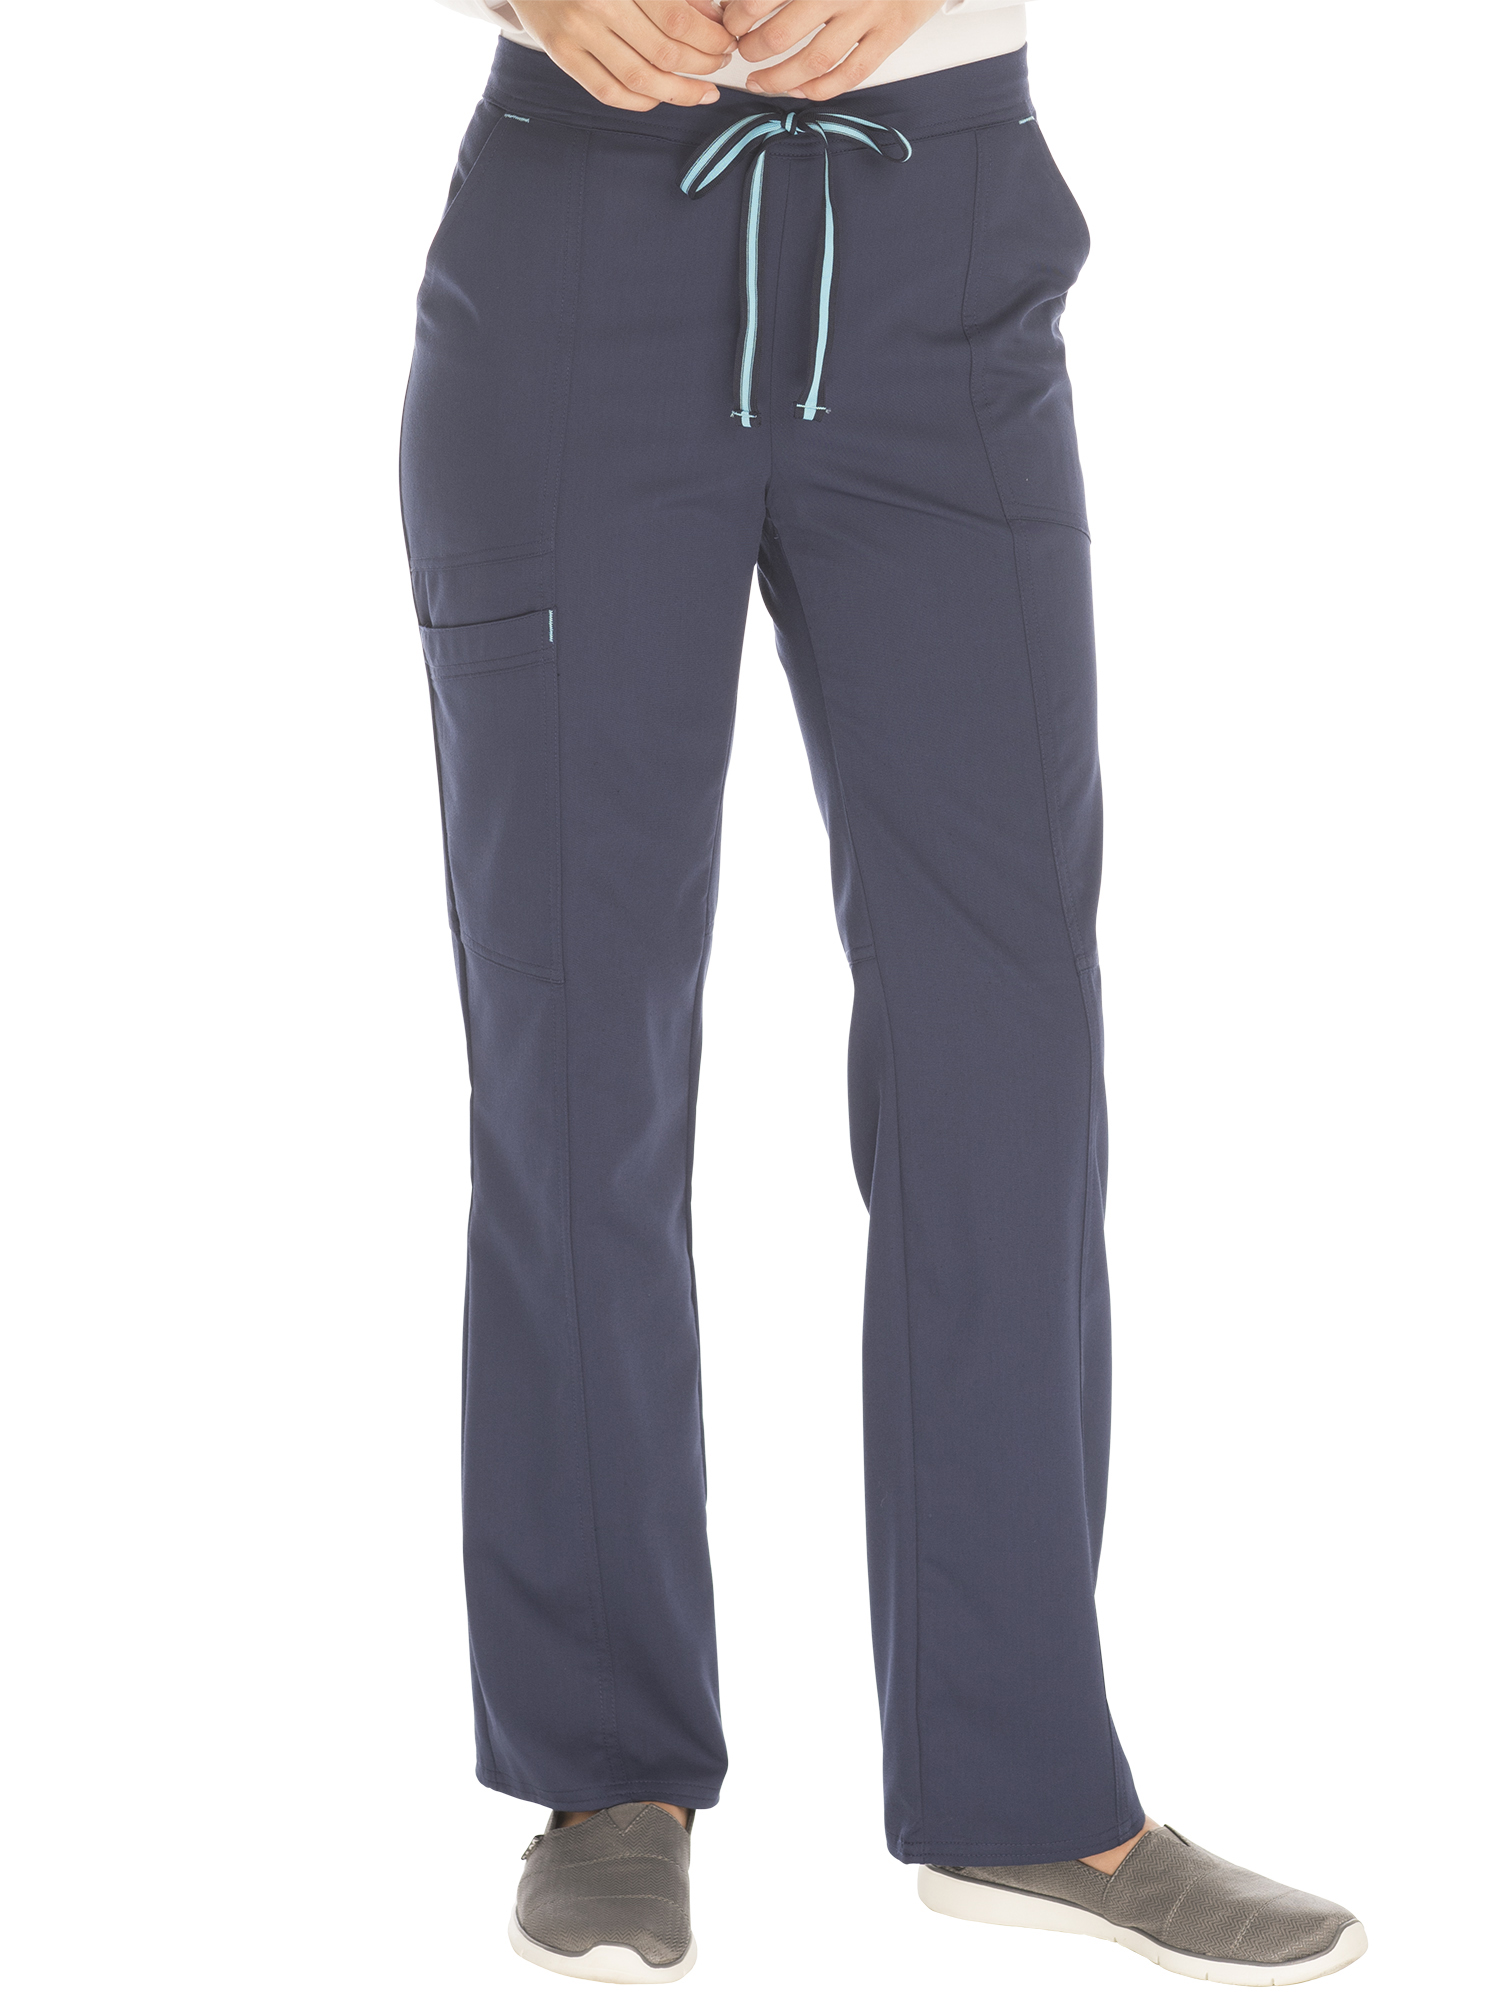 Scrubstar Women's Premium Collection Rayon Drawstring Cargo Scrub Pant